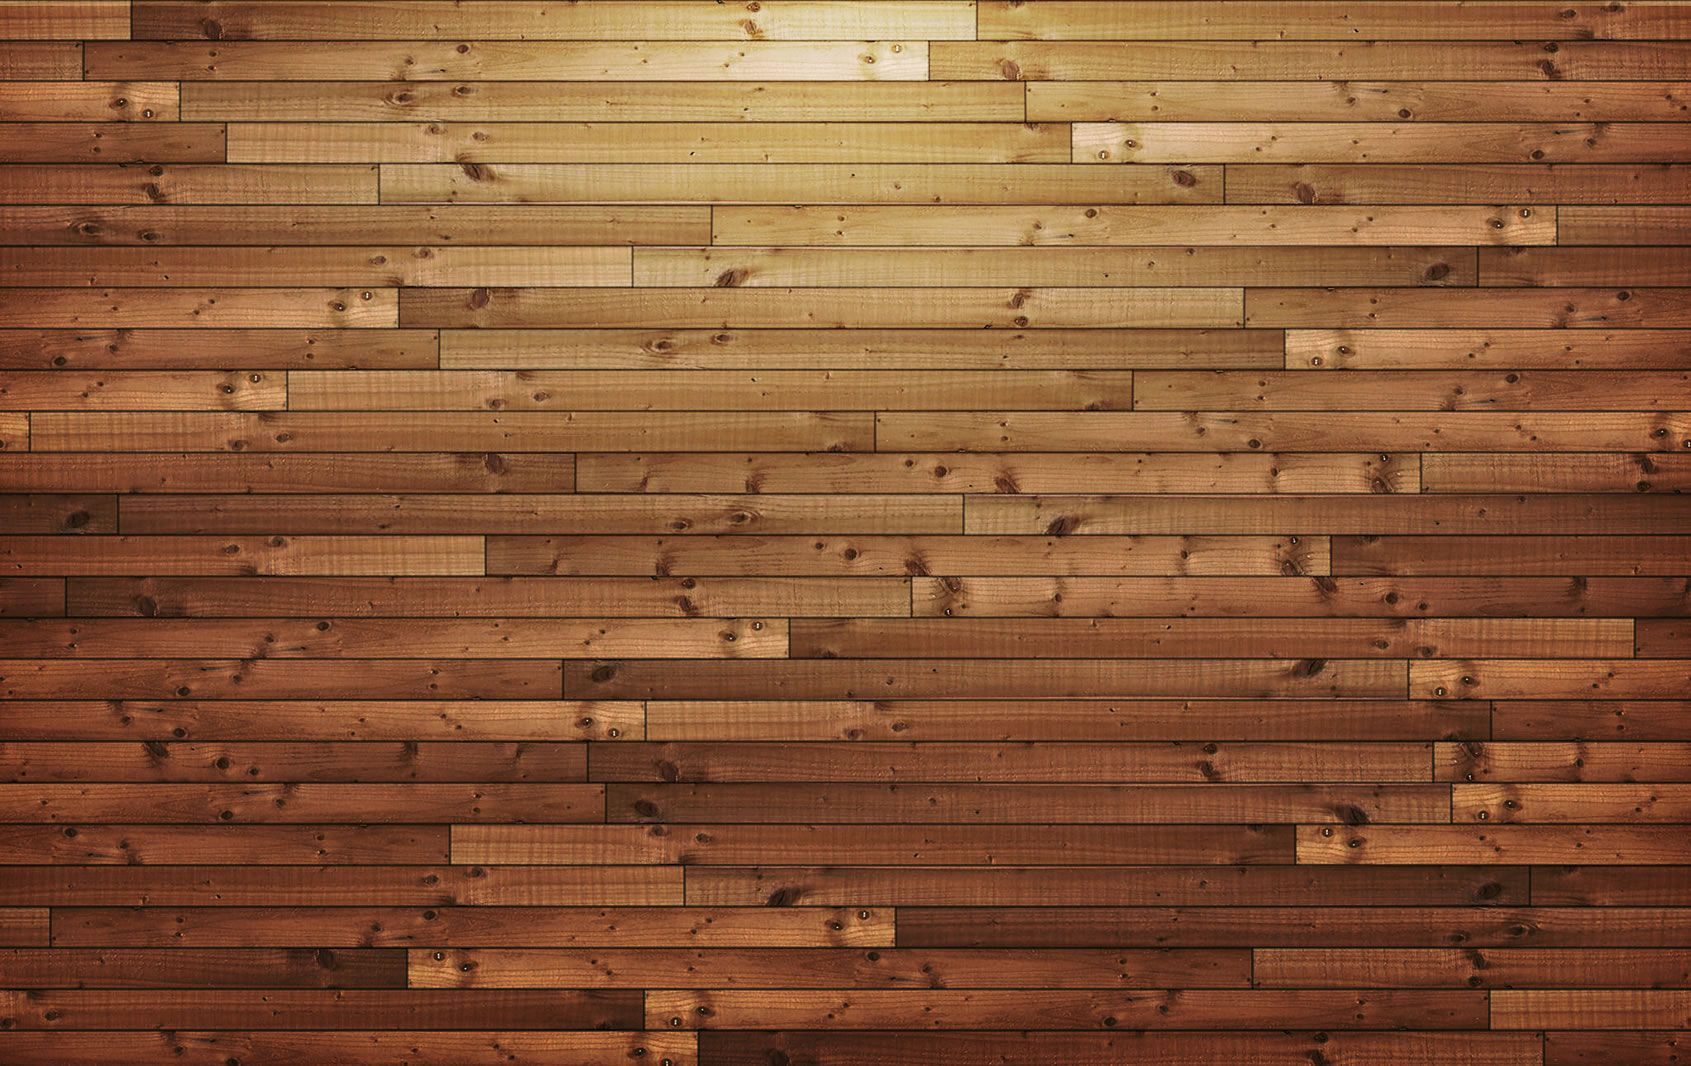 Horizontal Wood Panels Background Light To Dark Brown